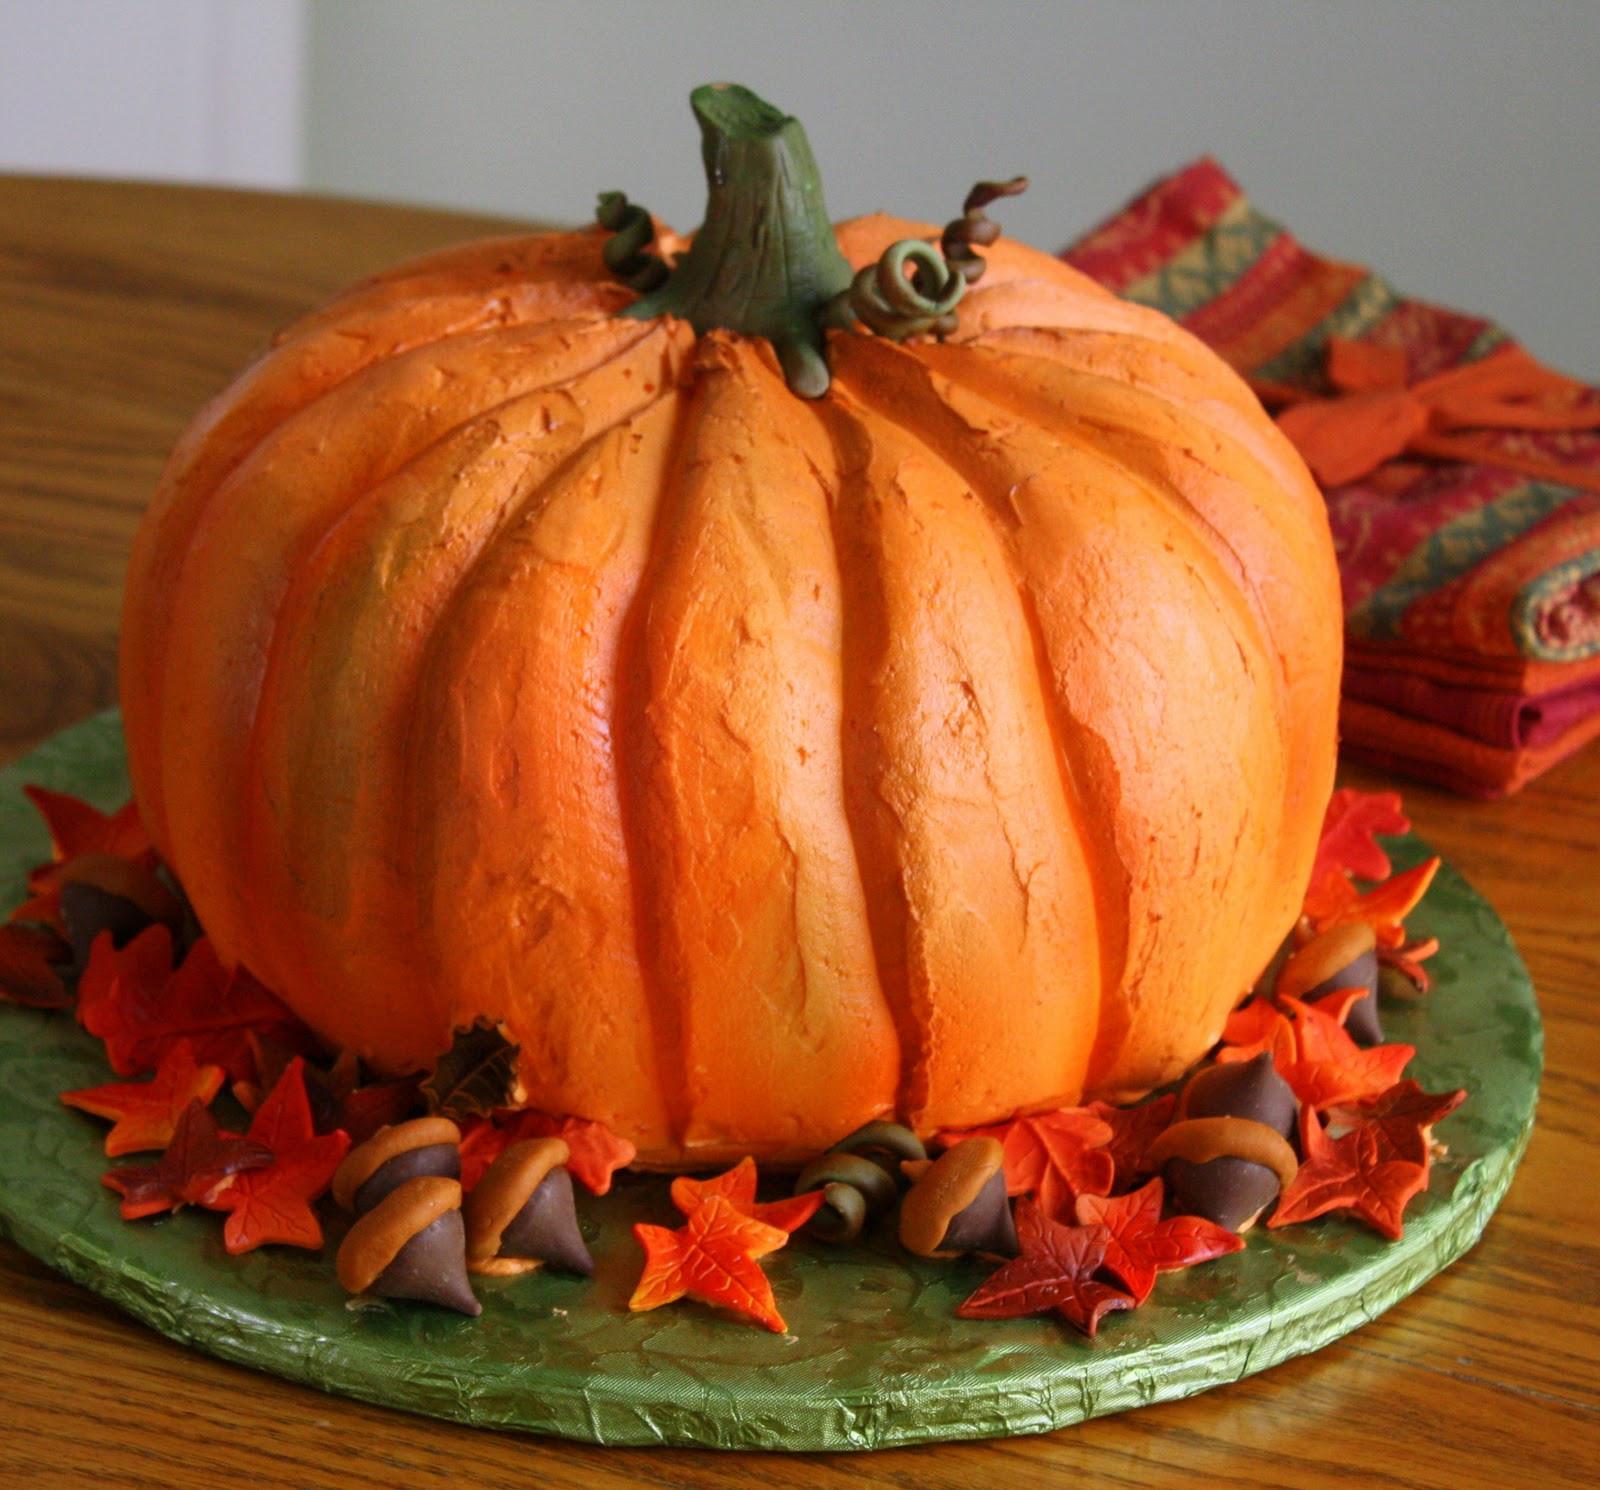 Halloween Pumpkin Cake  Jane s Sweets & Baking Journal The Cake that Thinks it s